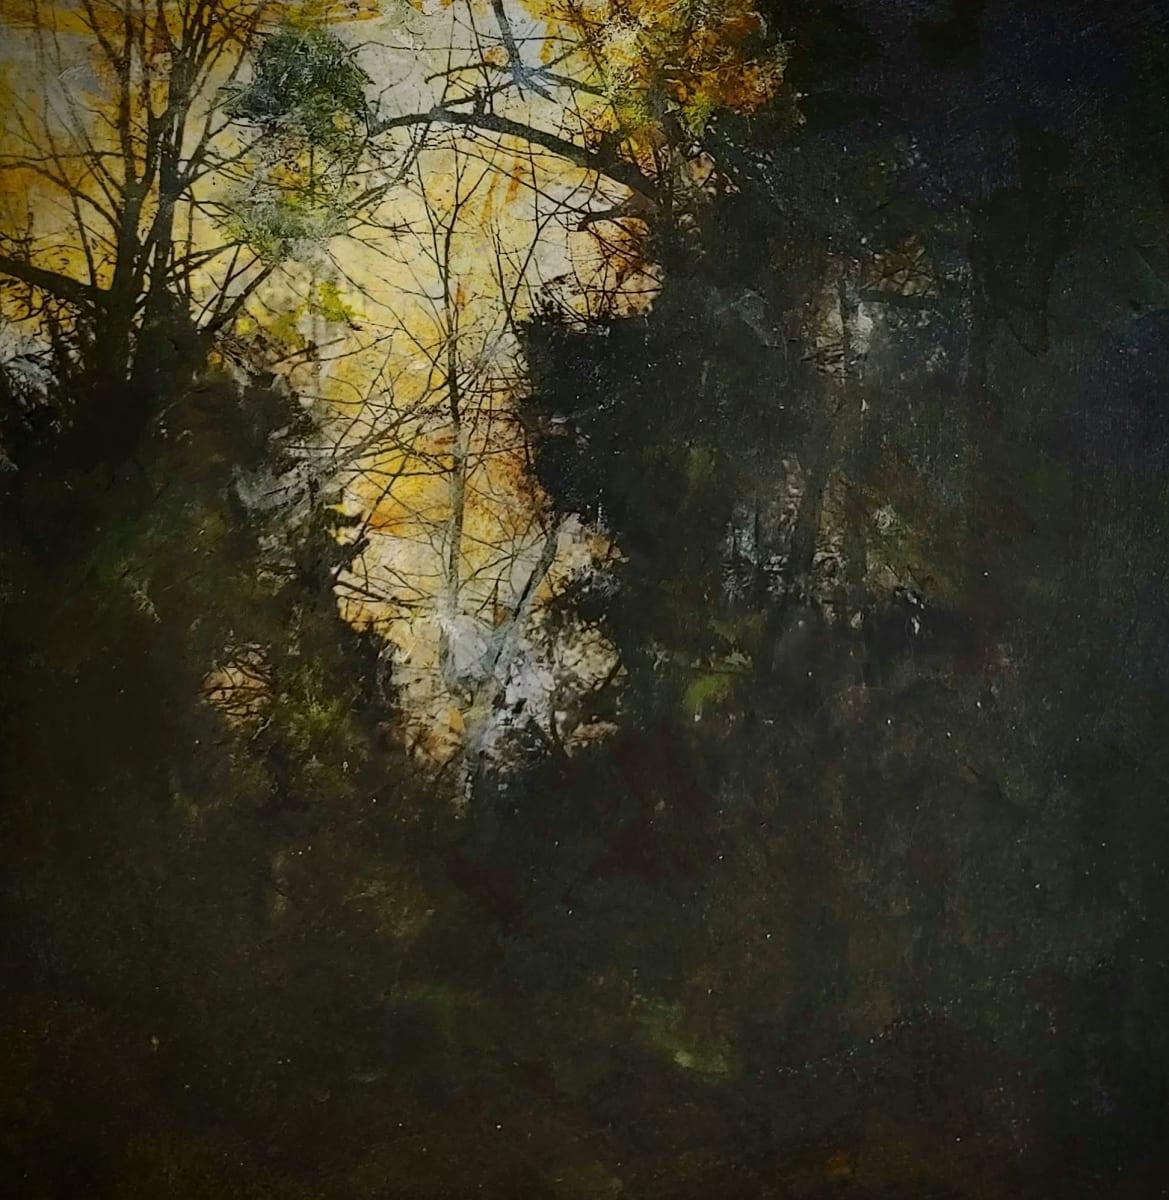 Sillhouette by Mary Mendla